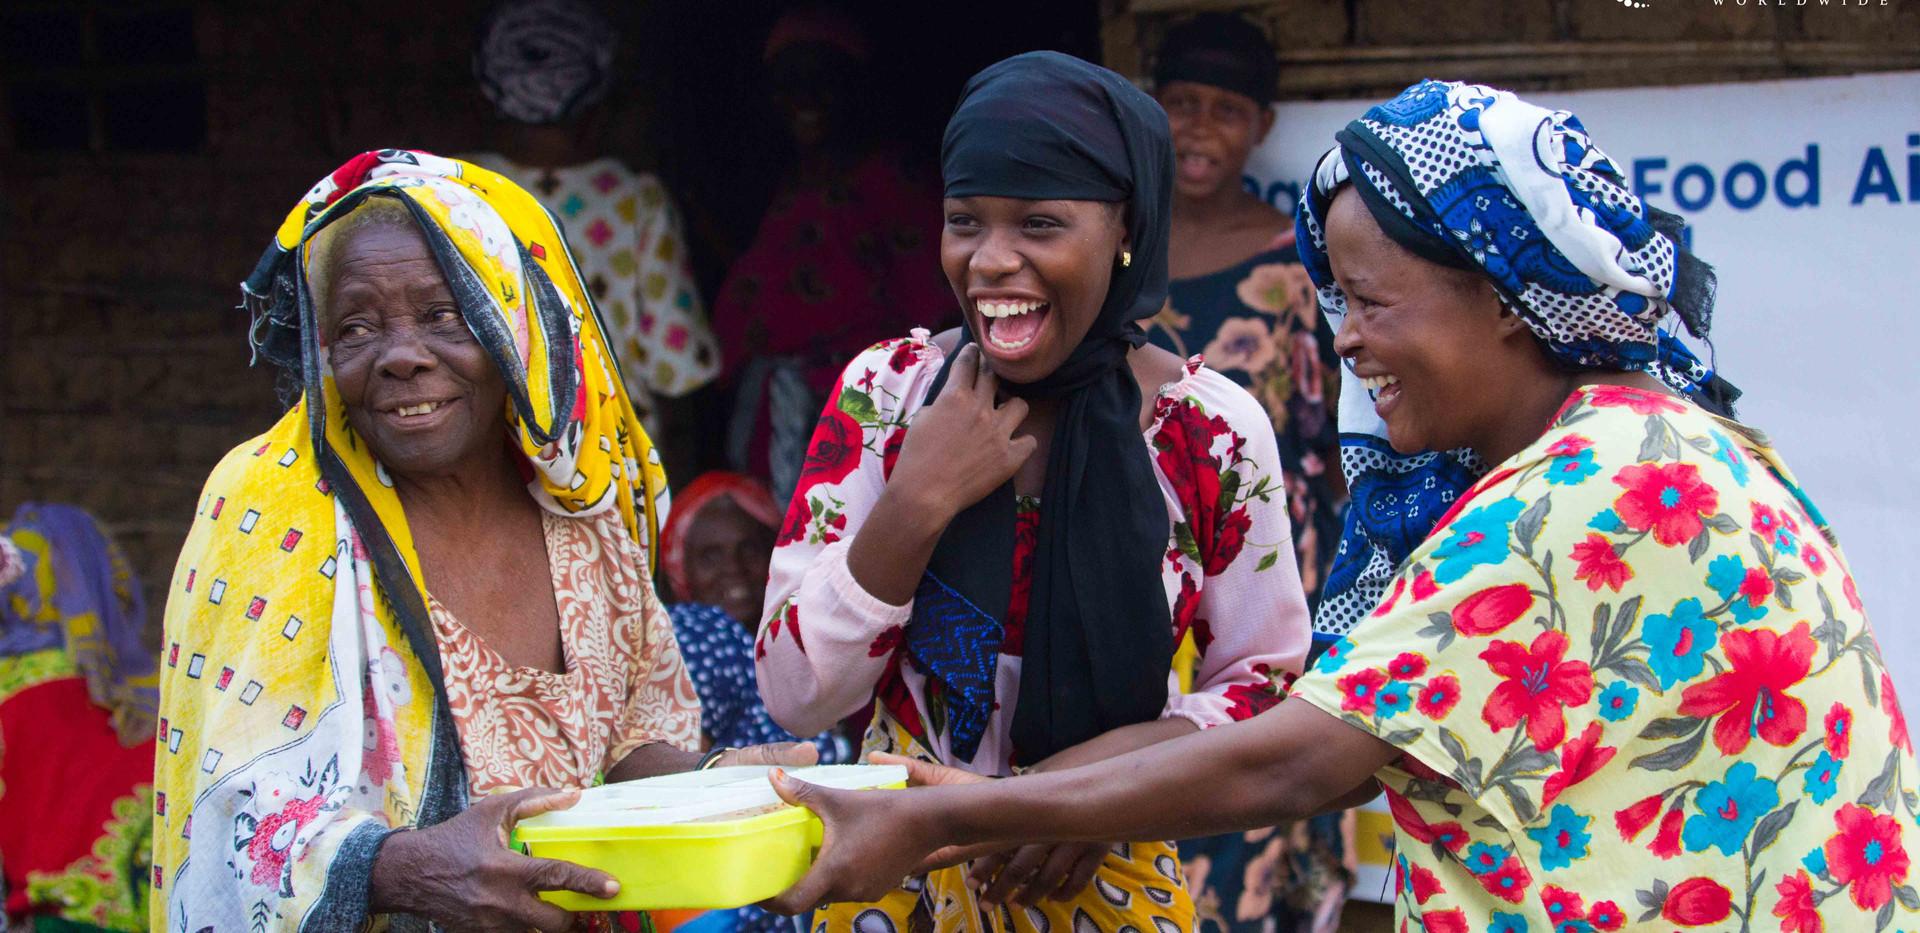 Meal Distribution in Tanzania